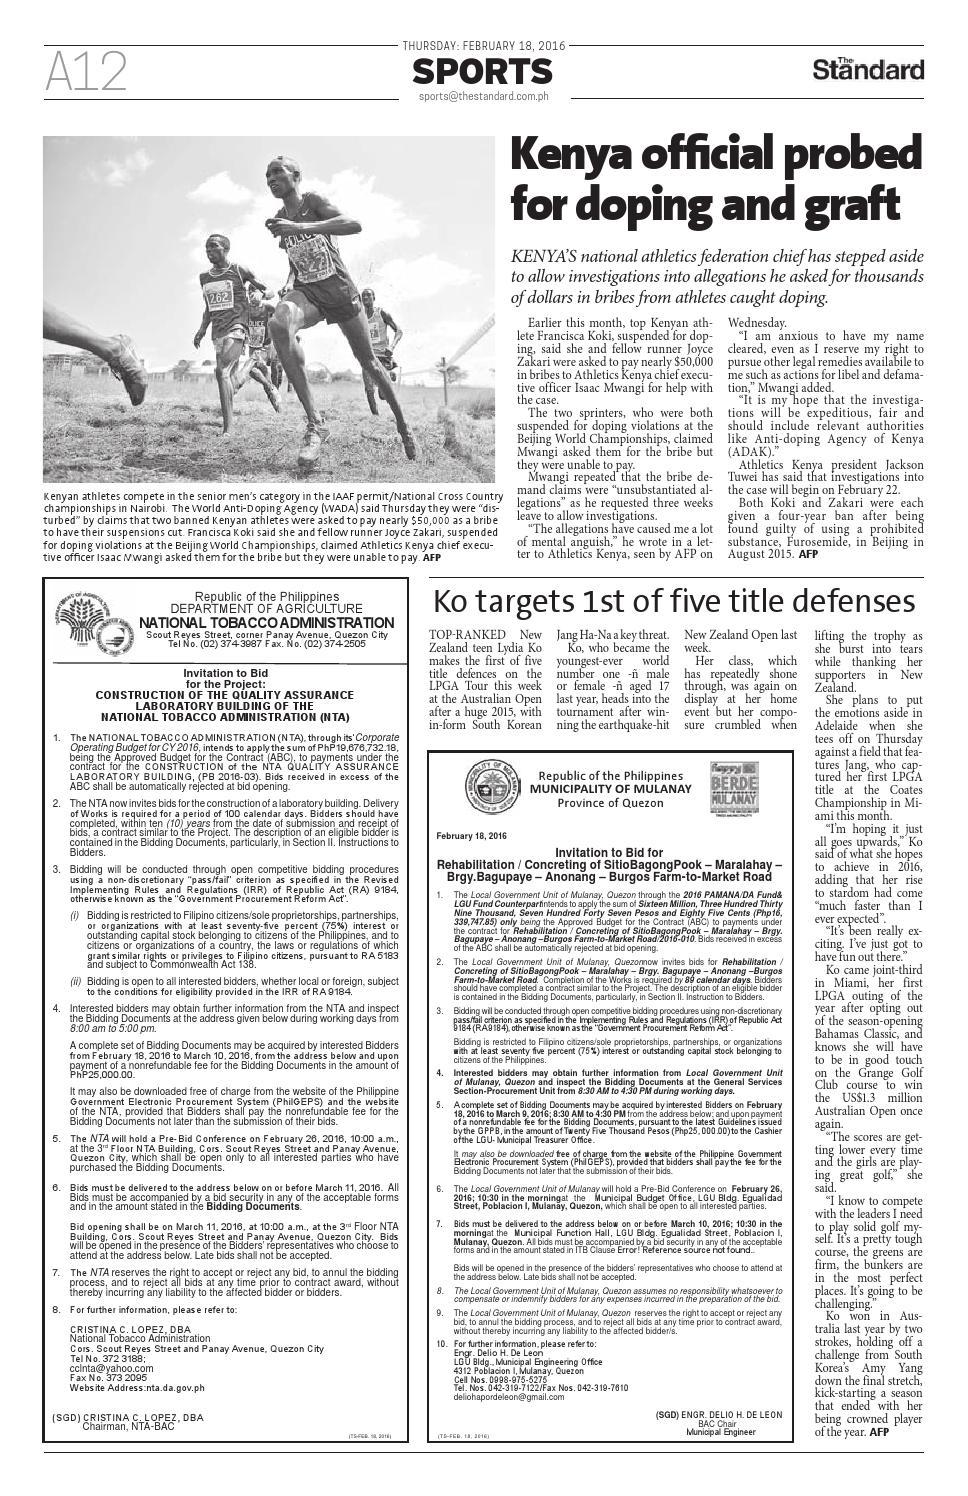 The Standard - 2016 February 18 - Thursday by Manila